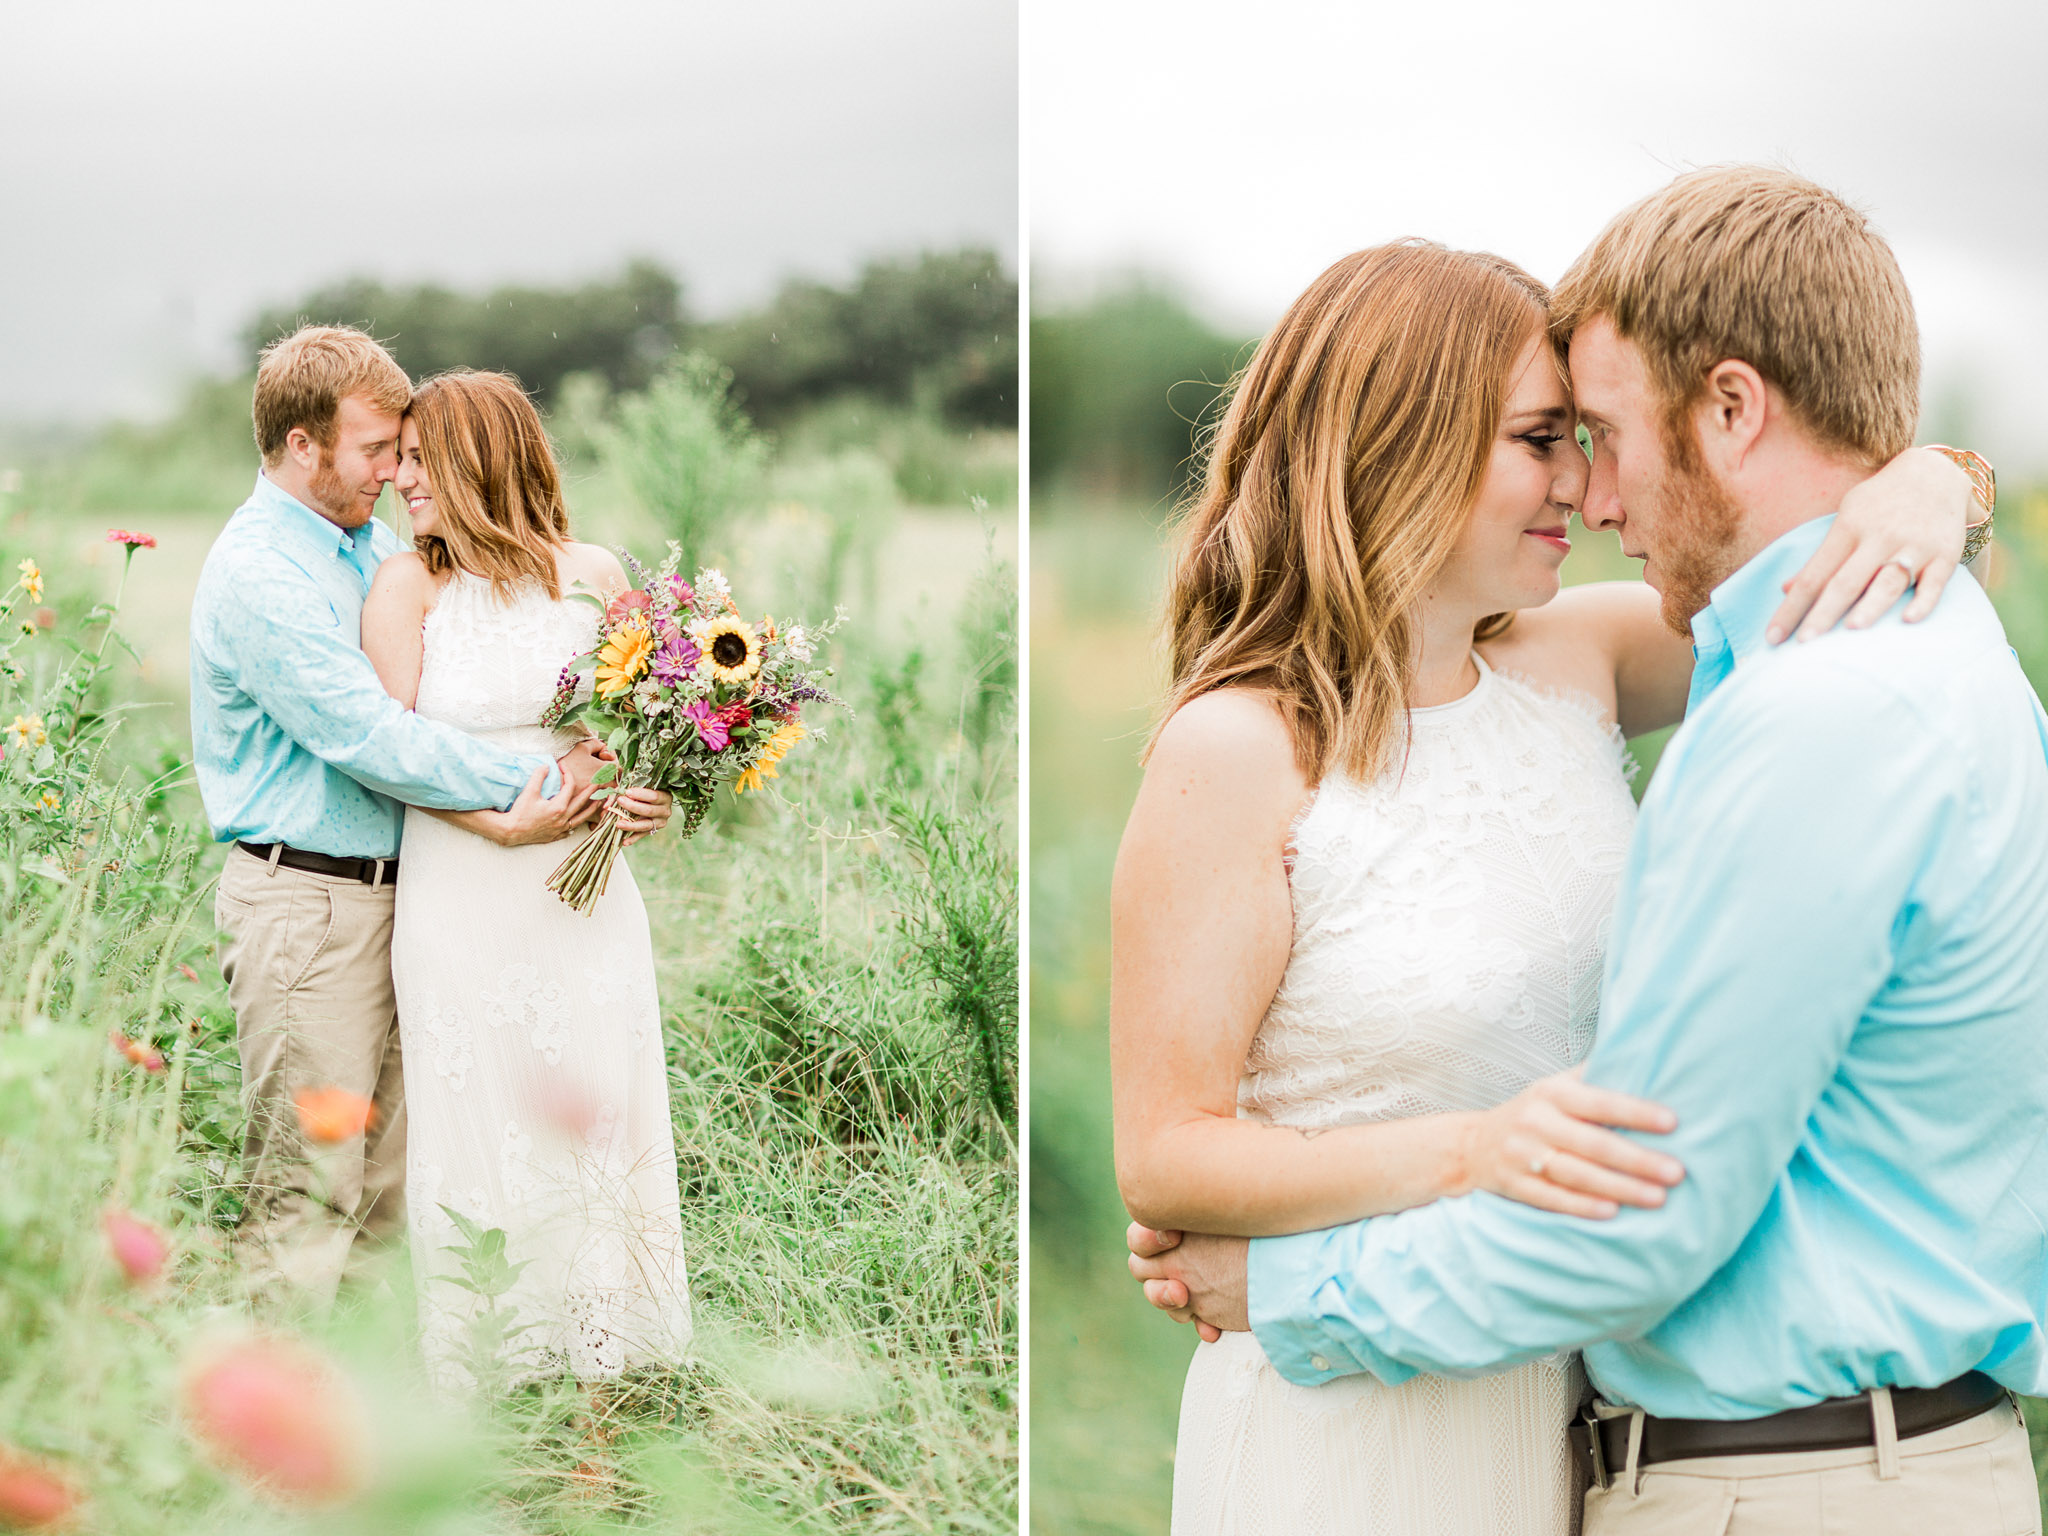 Wichita Falls, TX Engagement Photos - Fine Art Photography